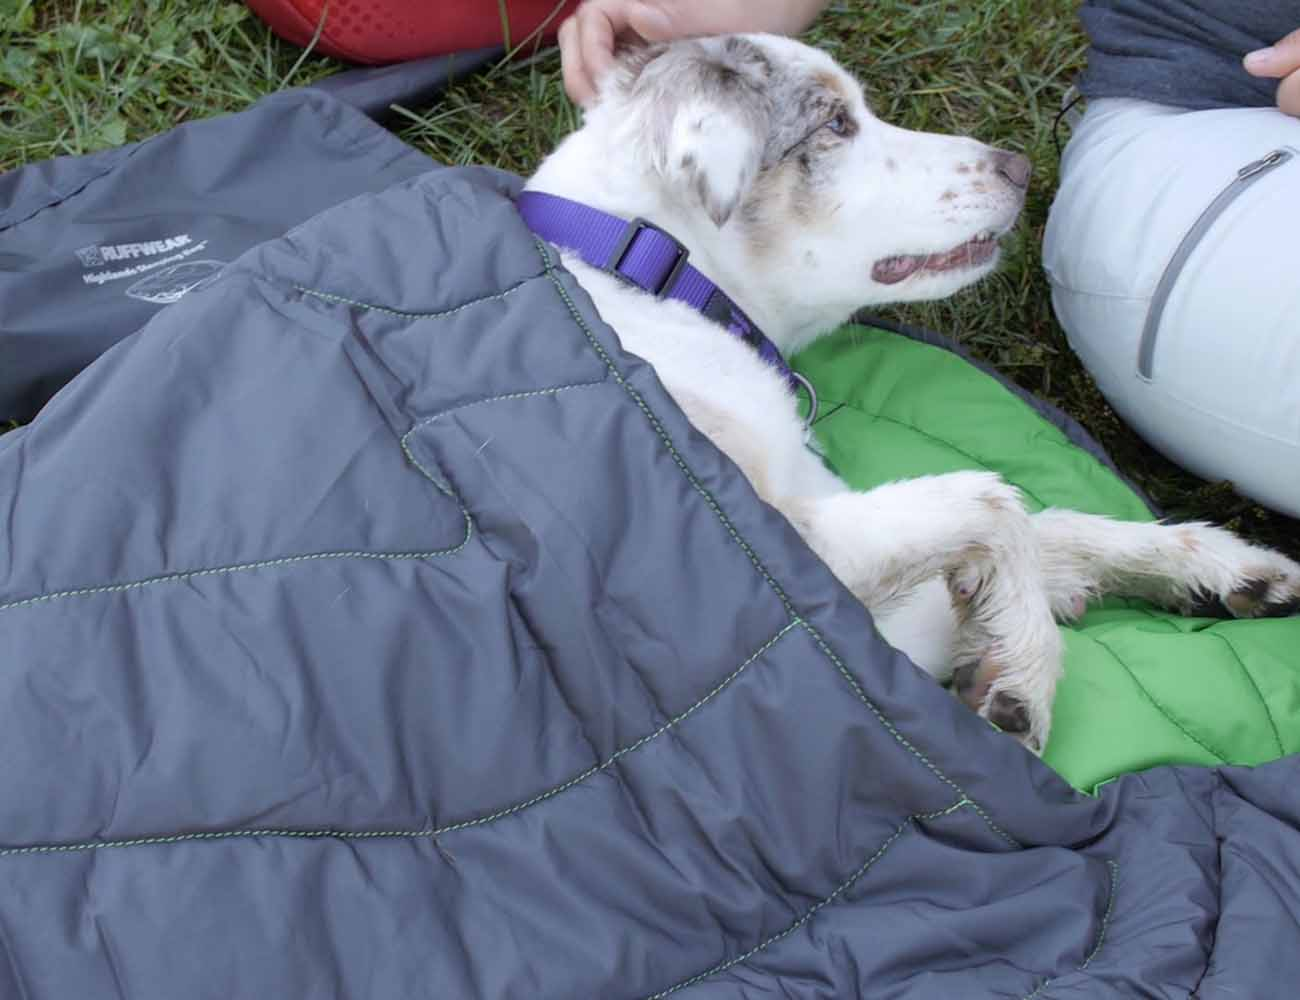 Ruffwear Highlands Sleeping Bag for Dogs